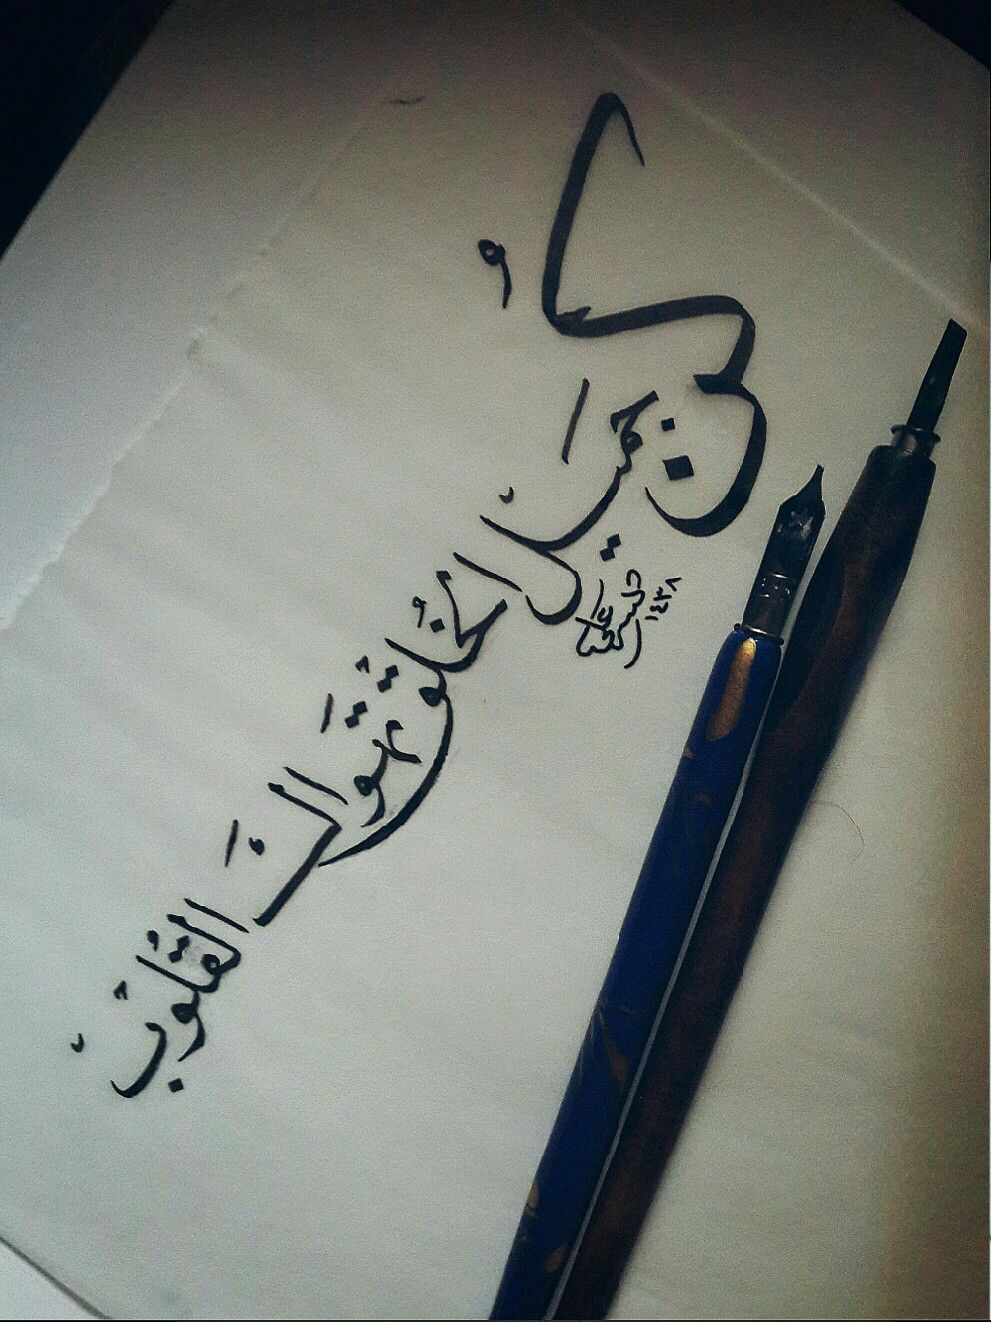 كن جميل الخ لق تهواك القلوب خطي نسخ Quotes For Book Lovers Proverbs Quotes Beautiful Arabic Words